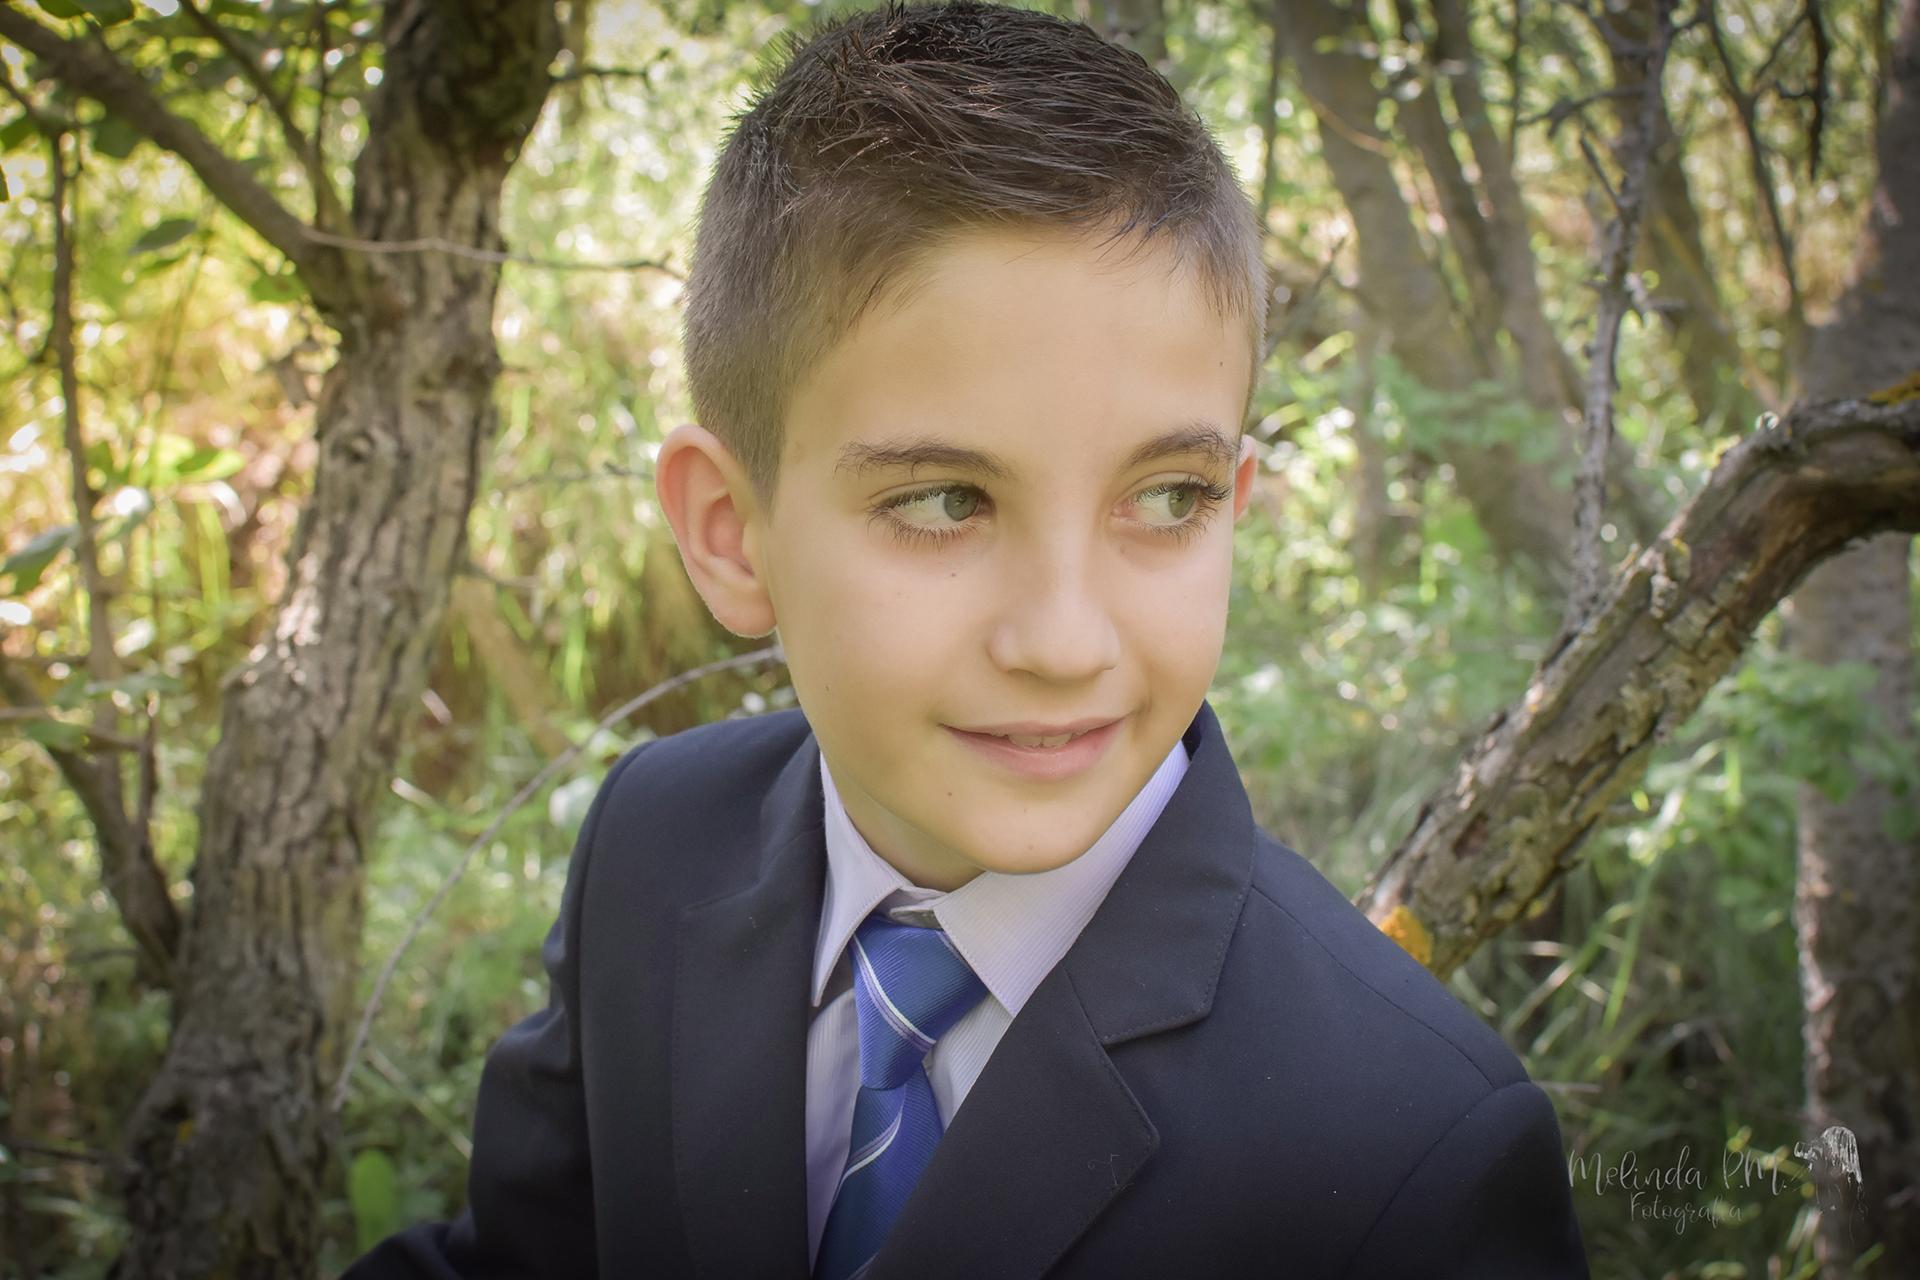 Reportaje de niño de Comunión   Raul 8